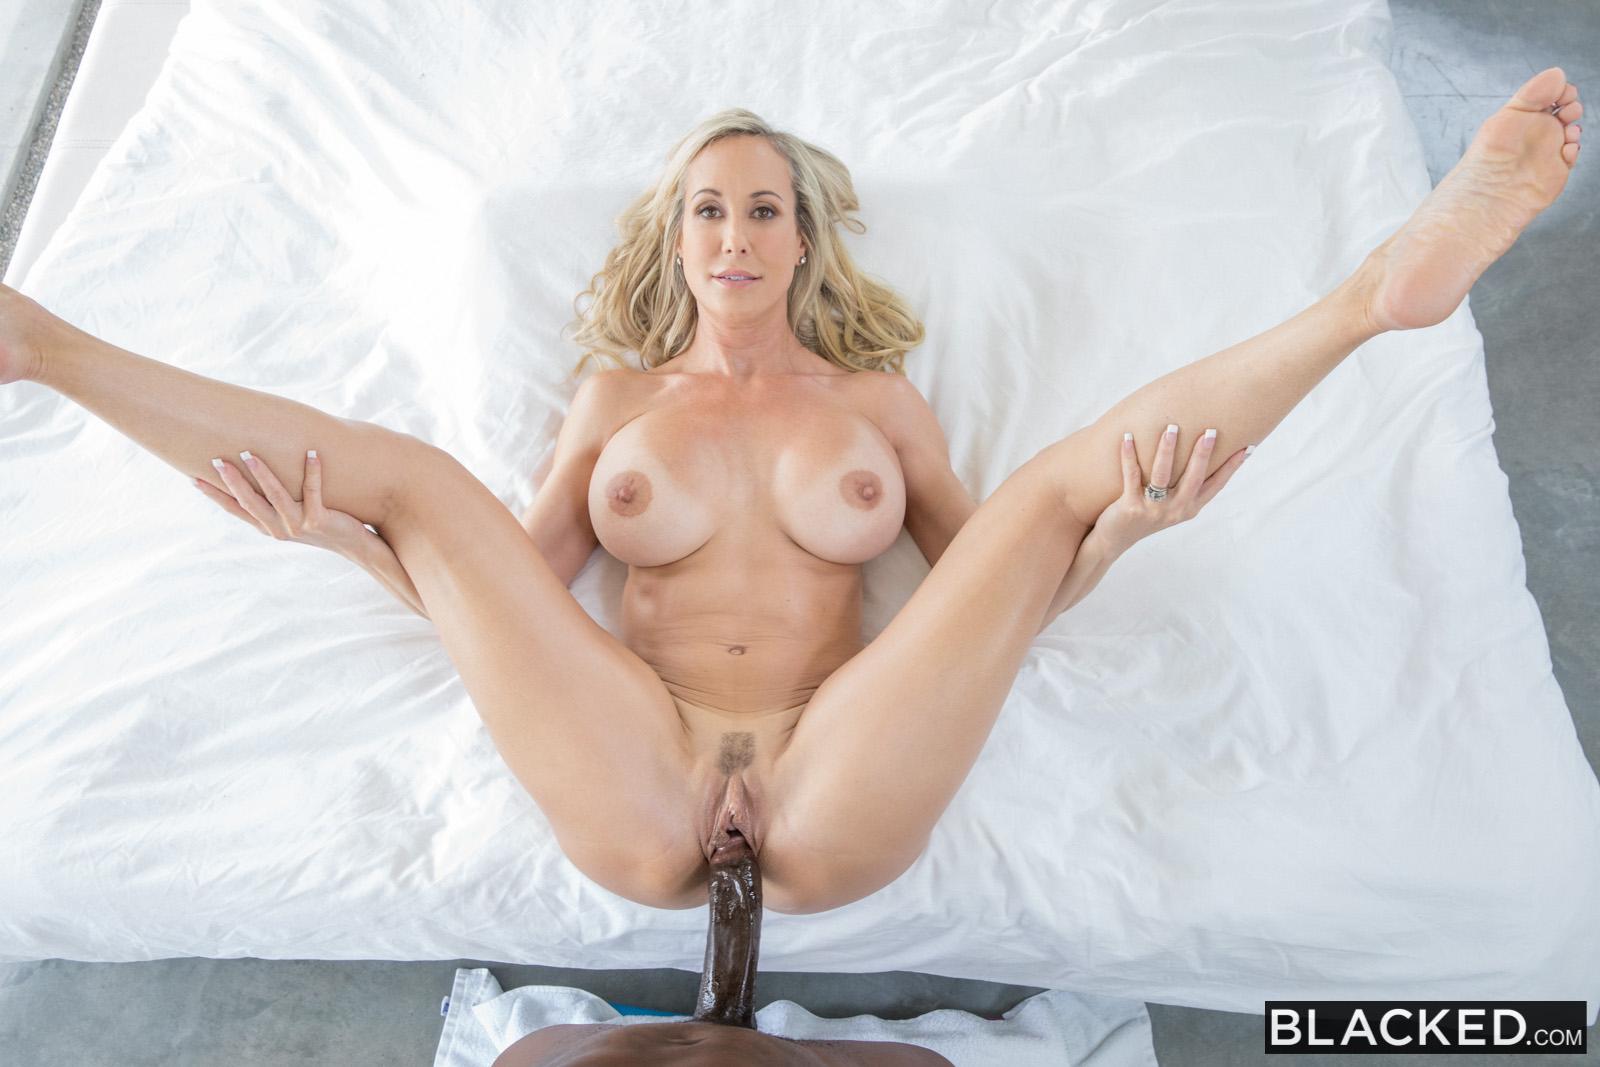 Big Dick Young Girl Anal